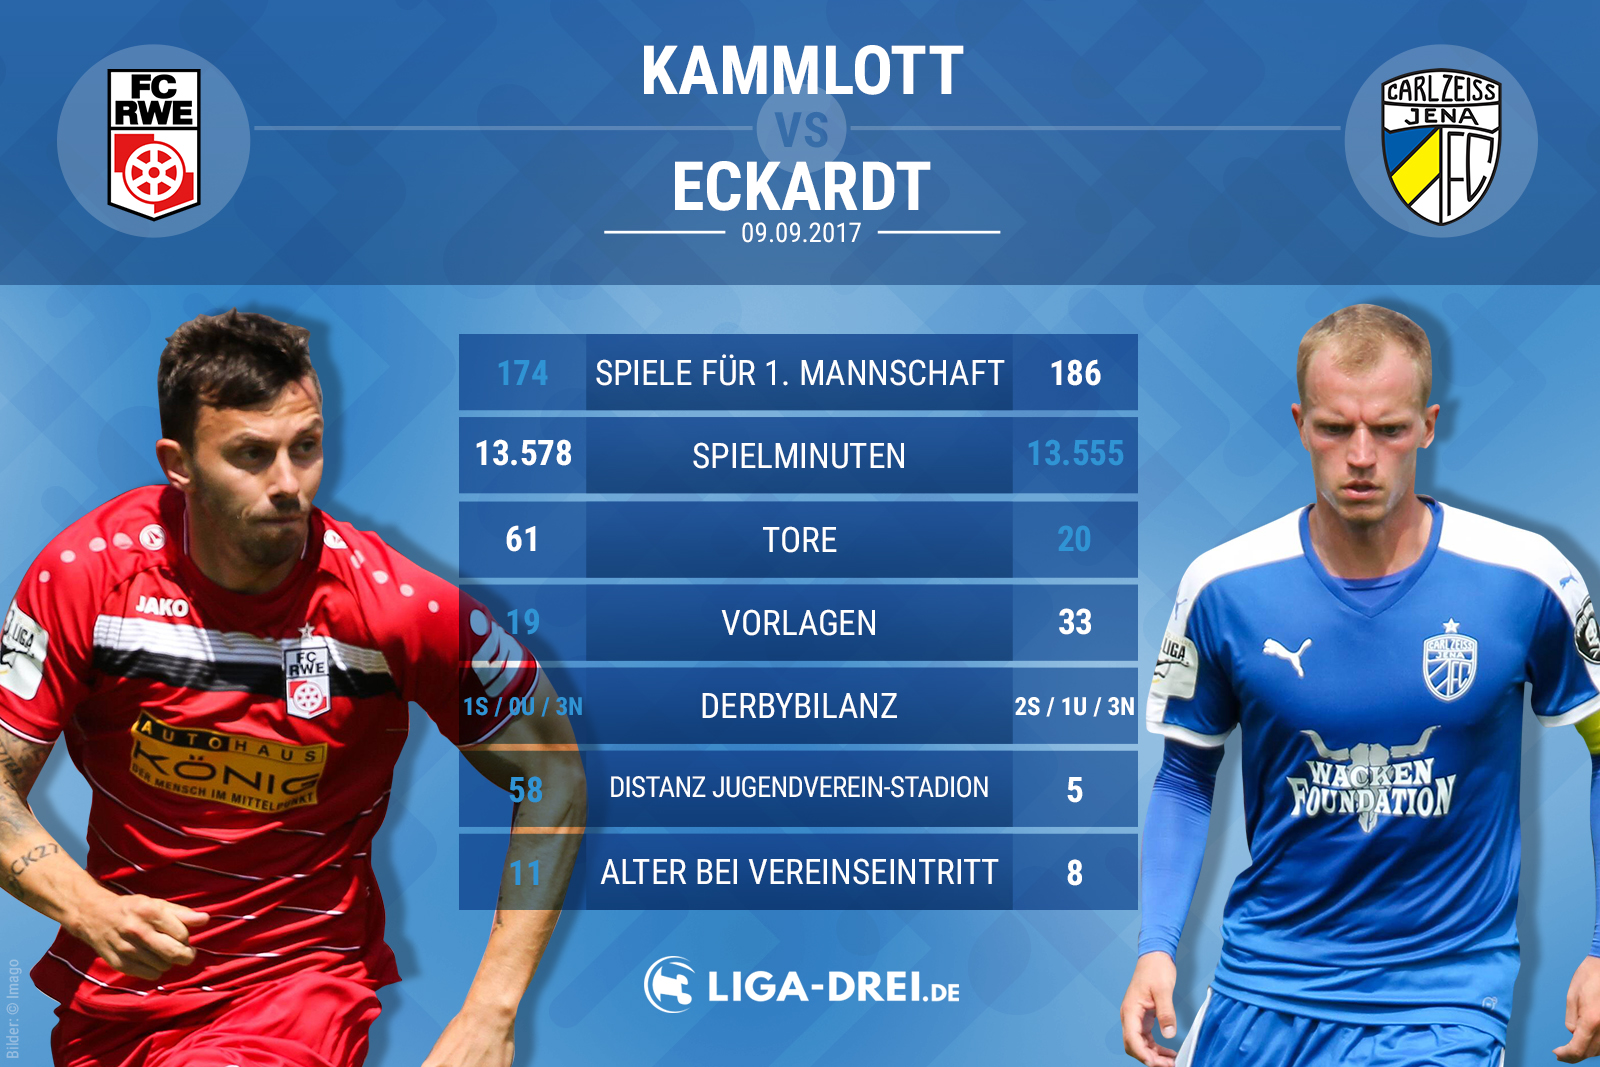 Spielervergleich Kammlott vs Eckardt